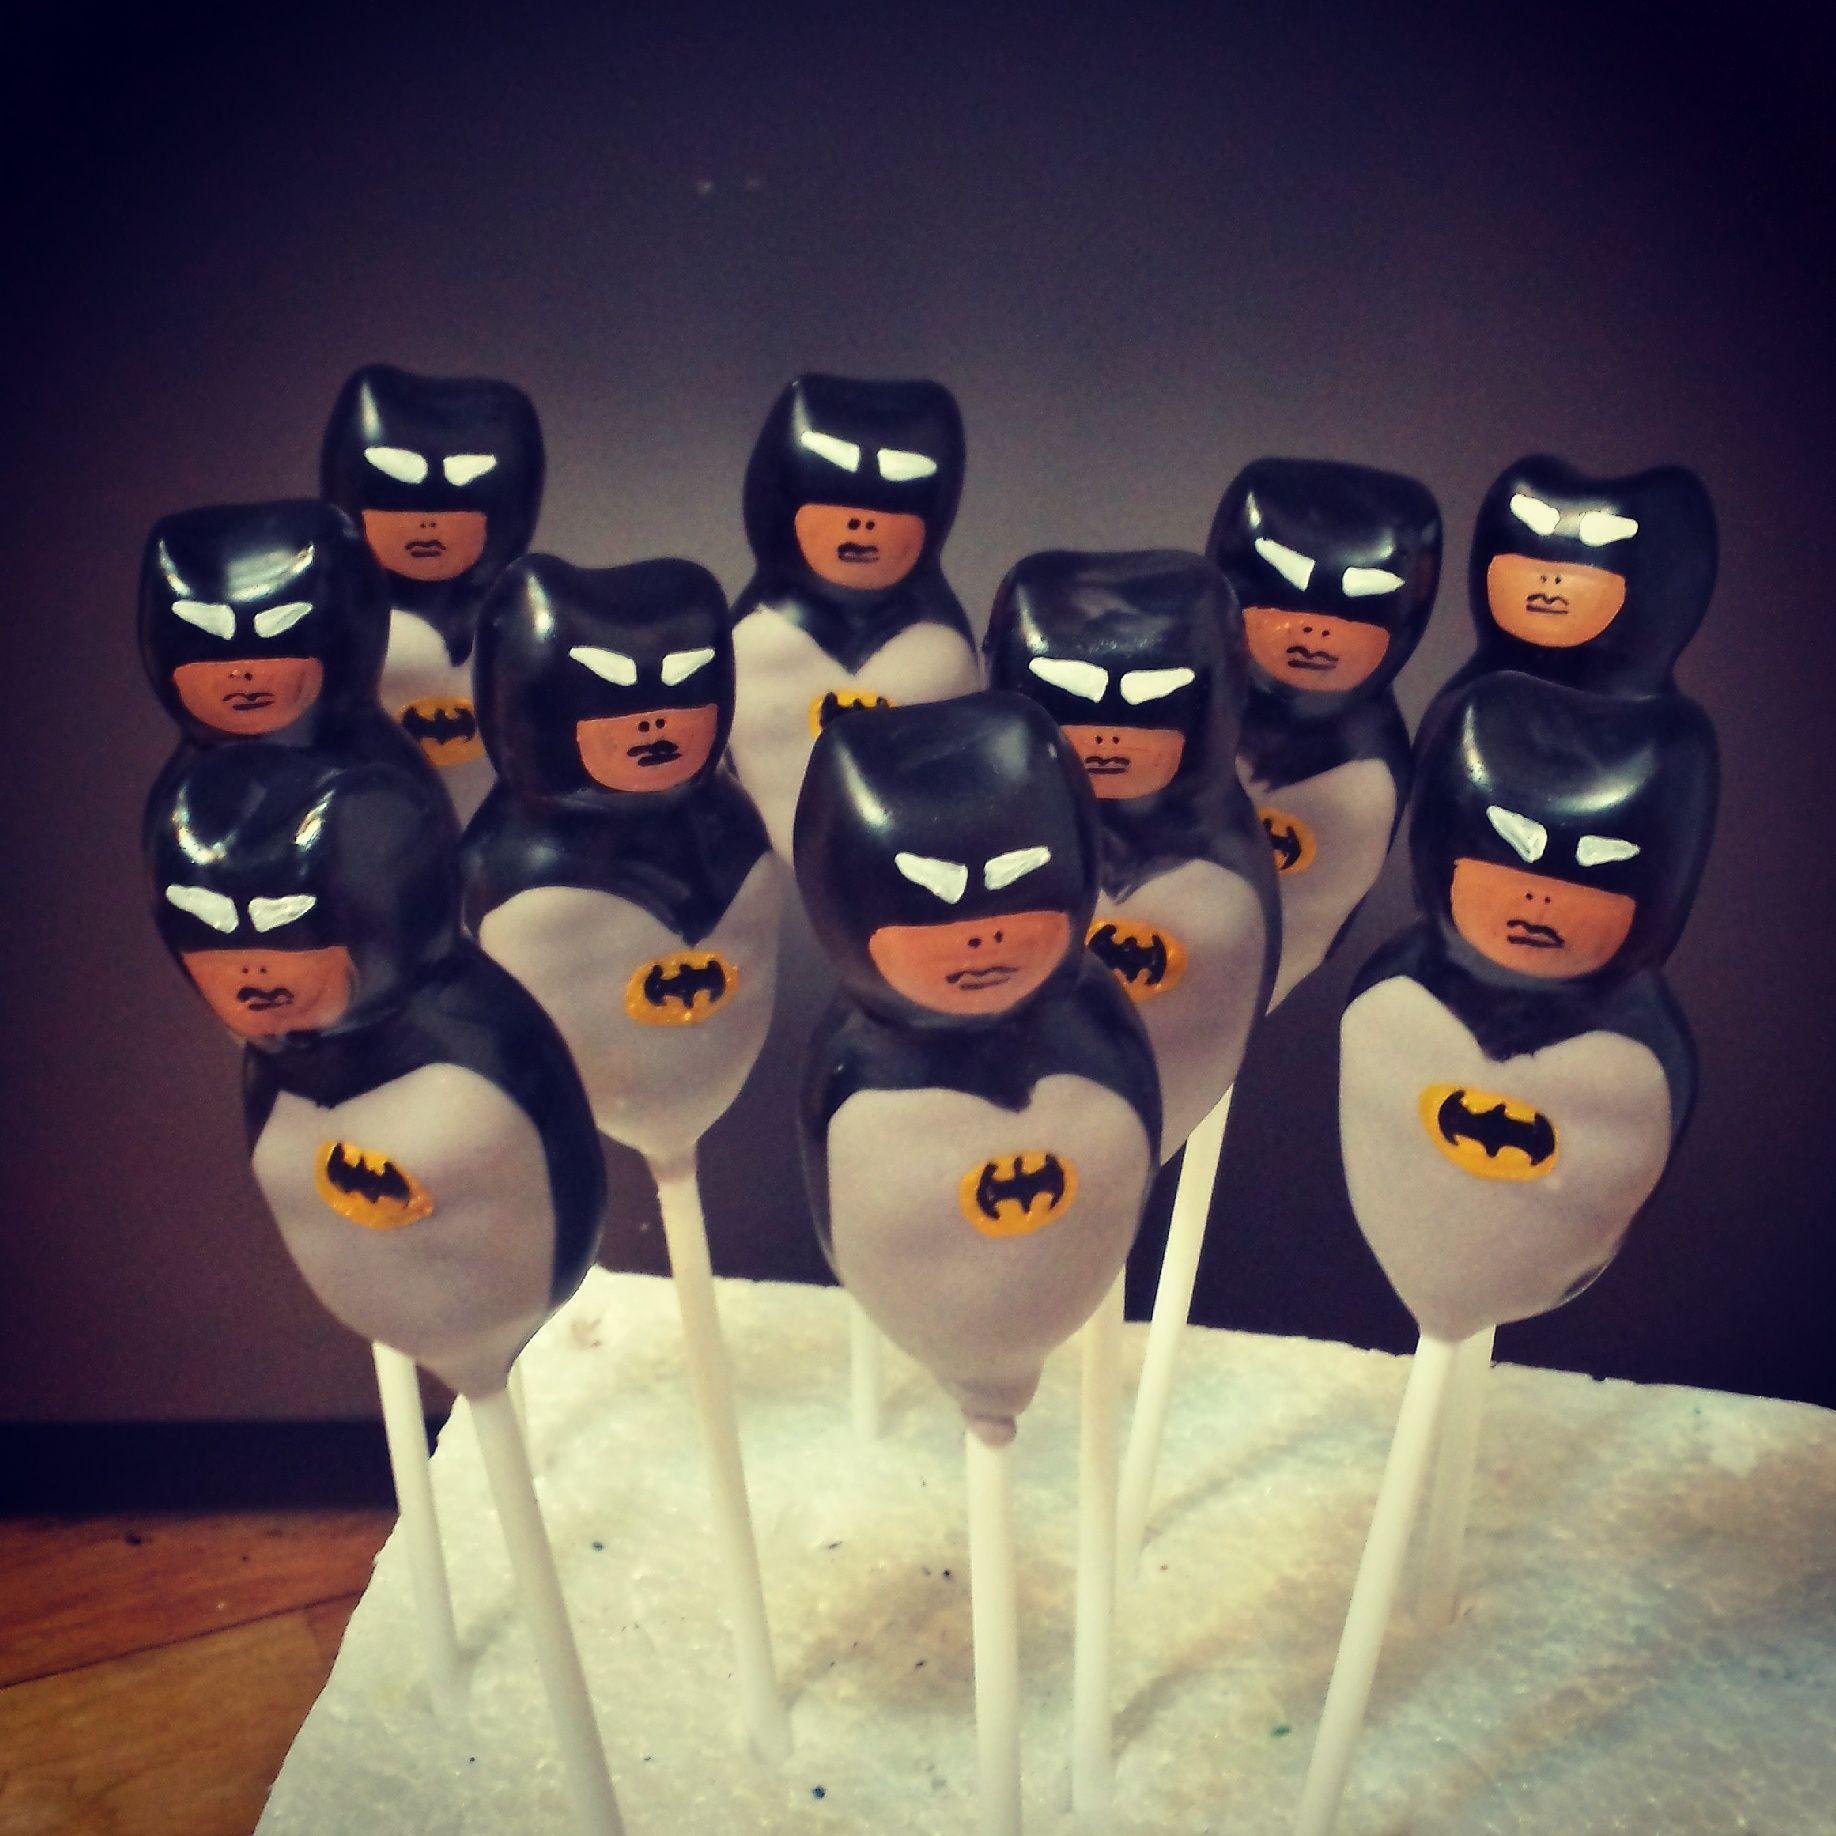 Batman cake pops delish cake pops batman cake pops